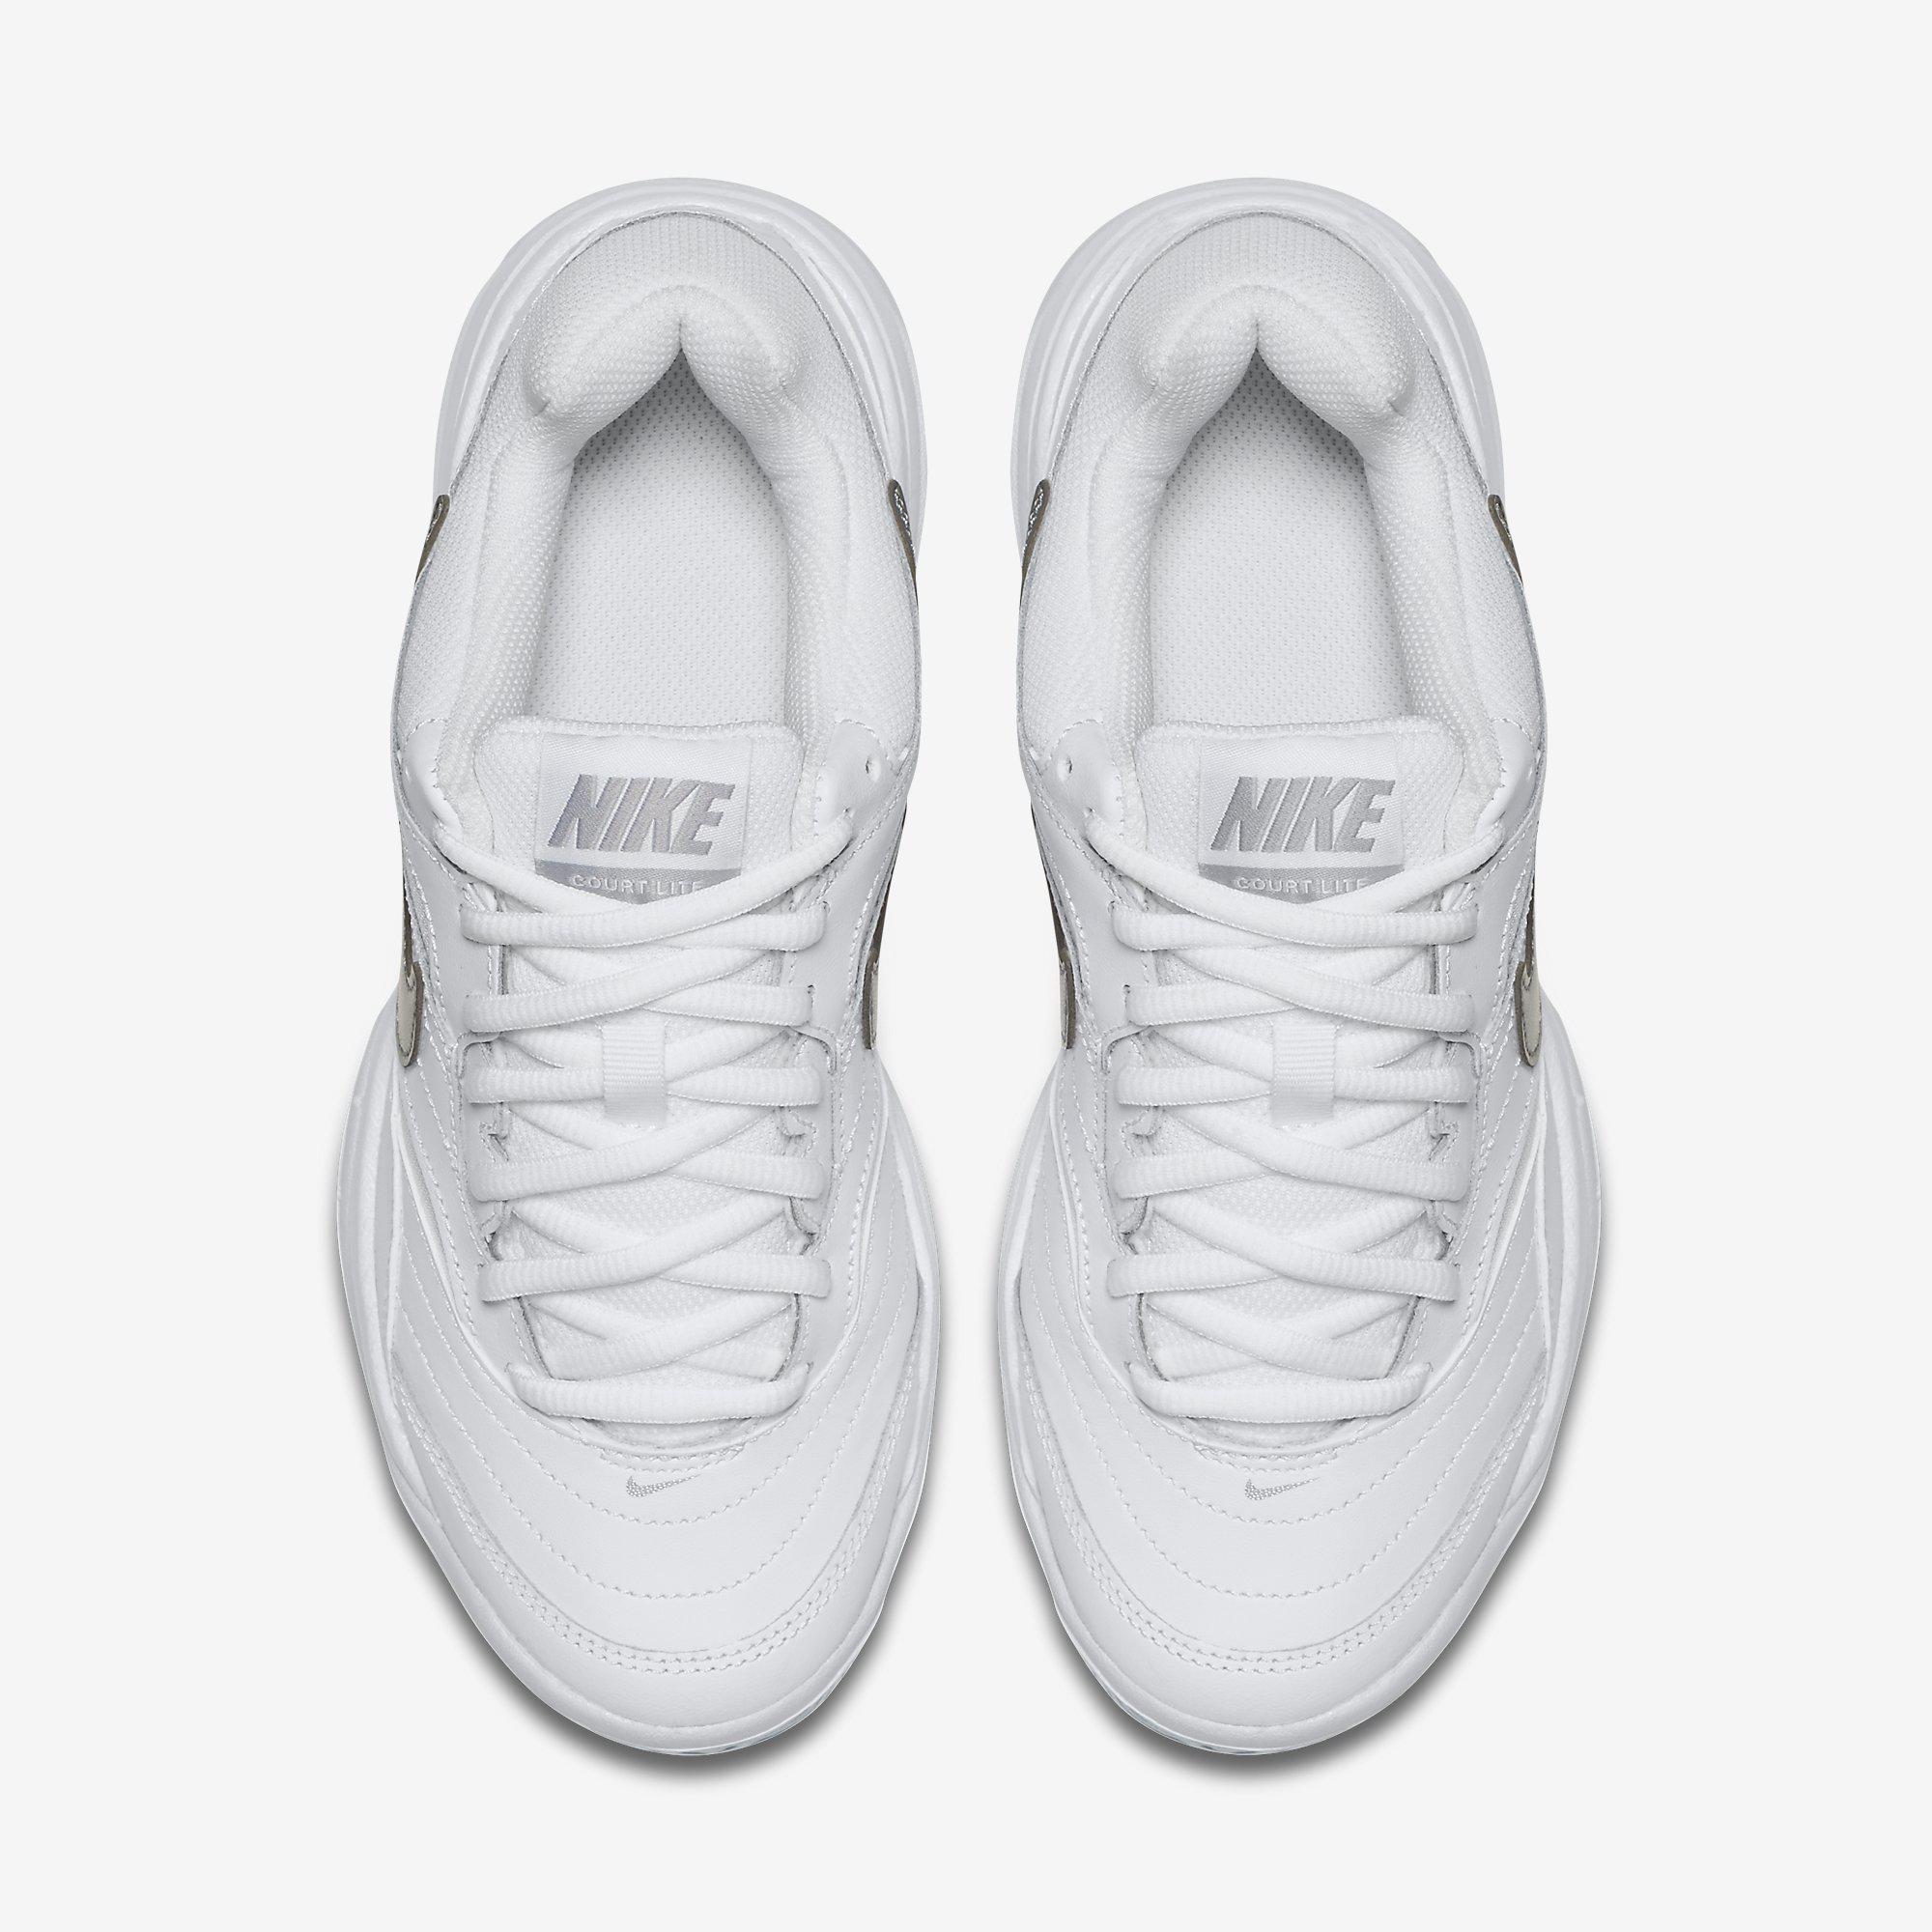 bdd8d8dfd3e Nike Womens Lite Tennis Shoes - White Grey - Tennisnuts.com